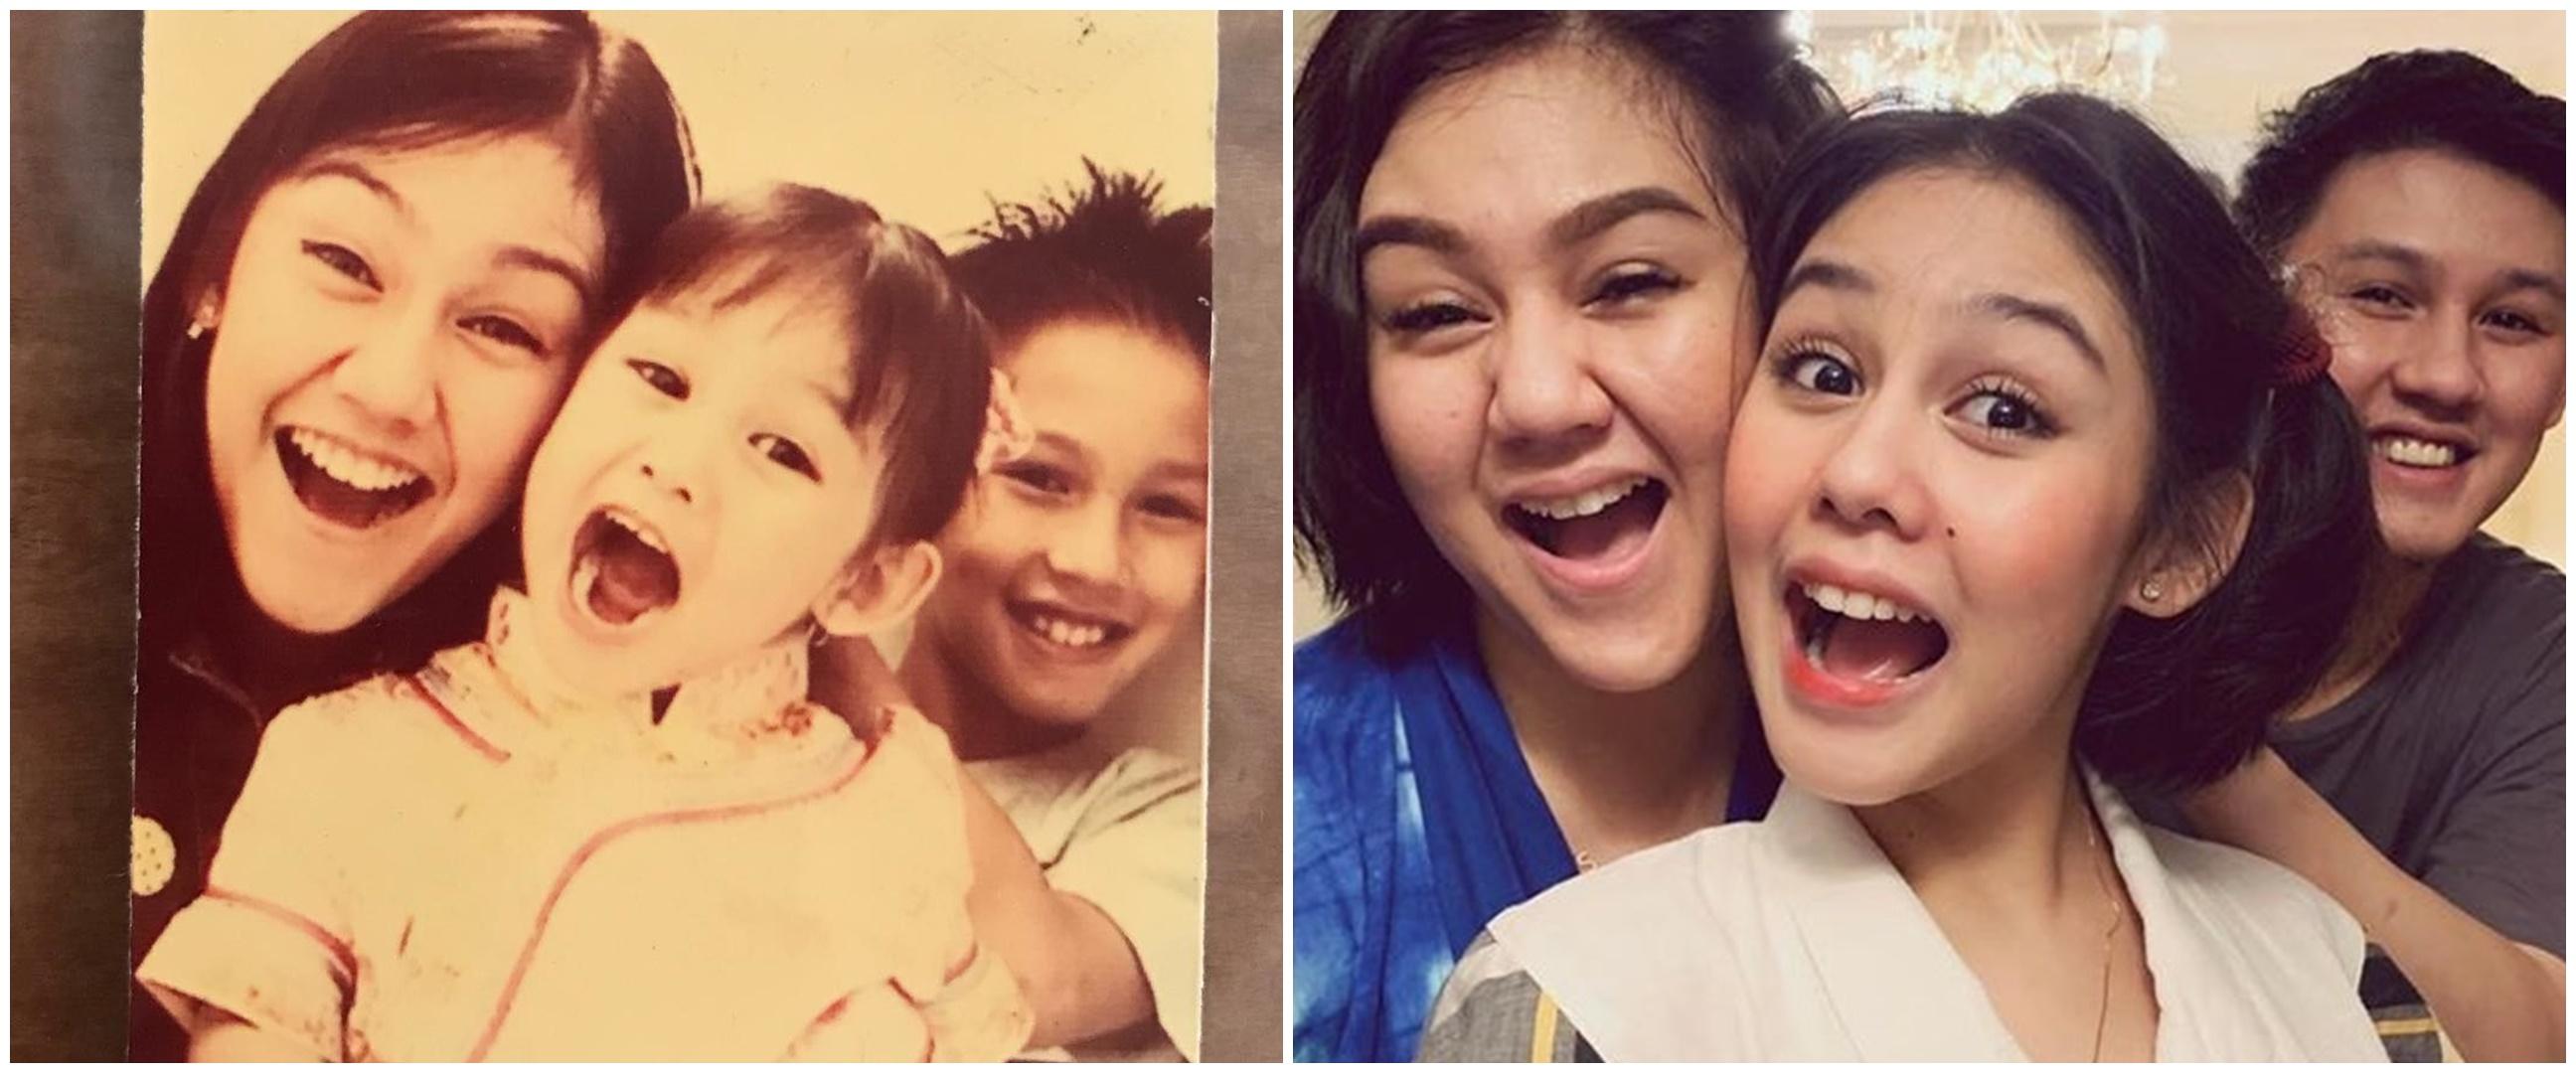 Gaya 10 seleb tirukan foto masa kecil, pose Megan Domani kocak